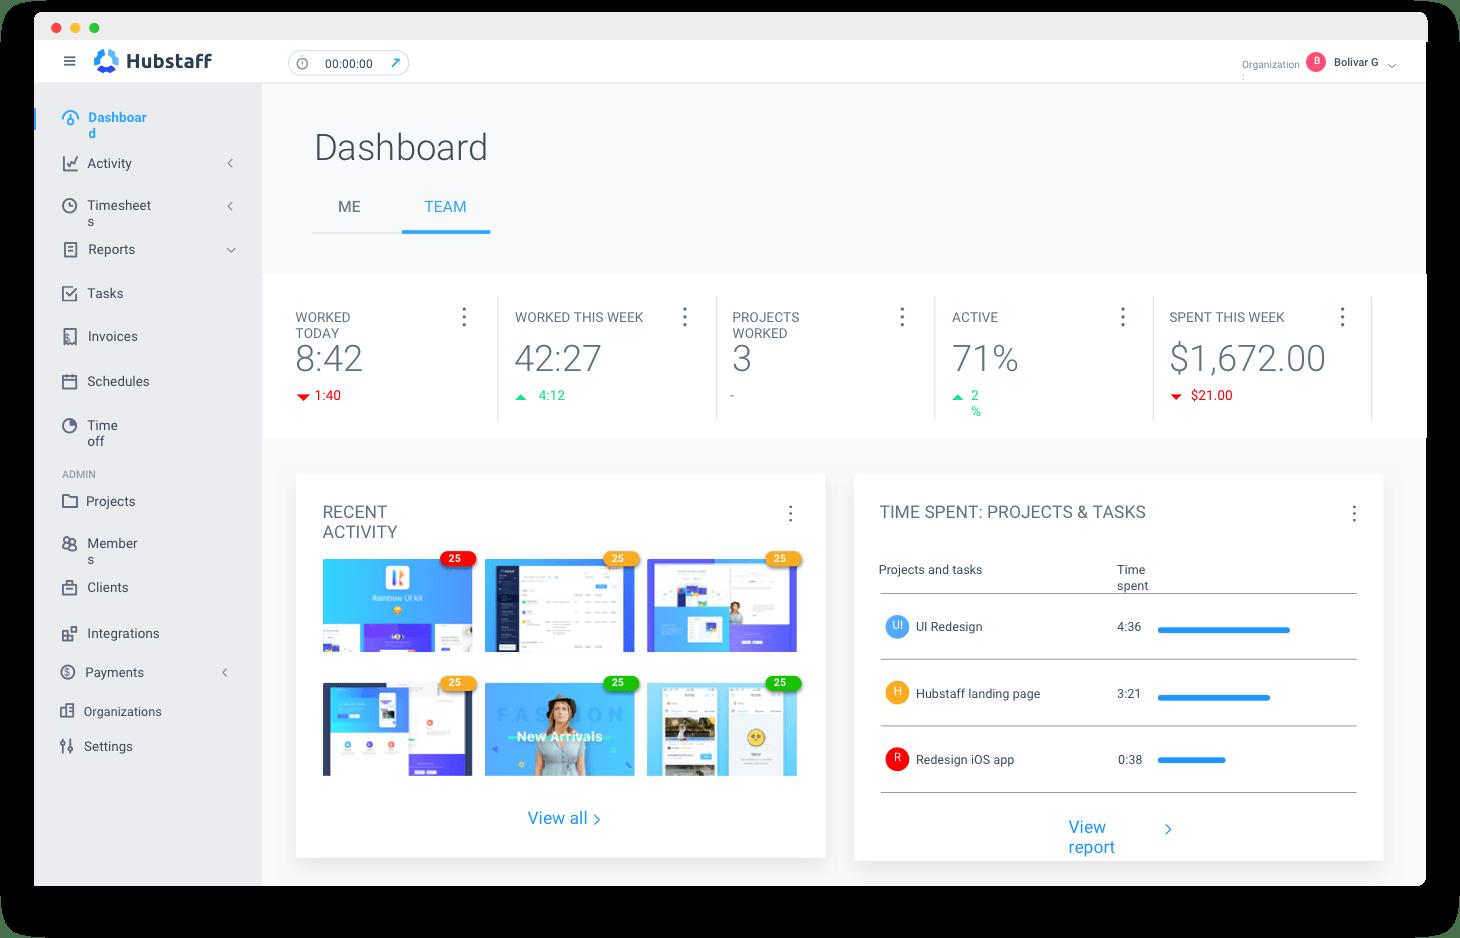 Hubstaff dashboard